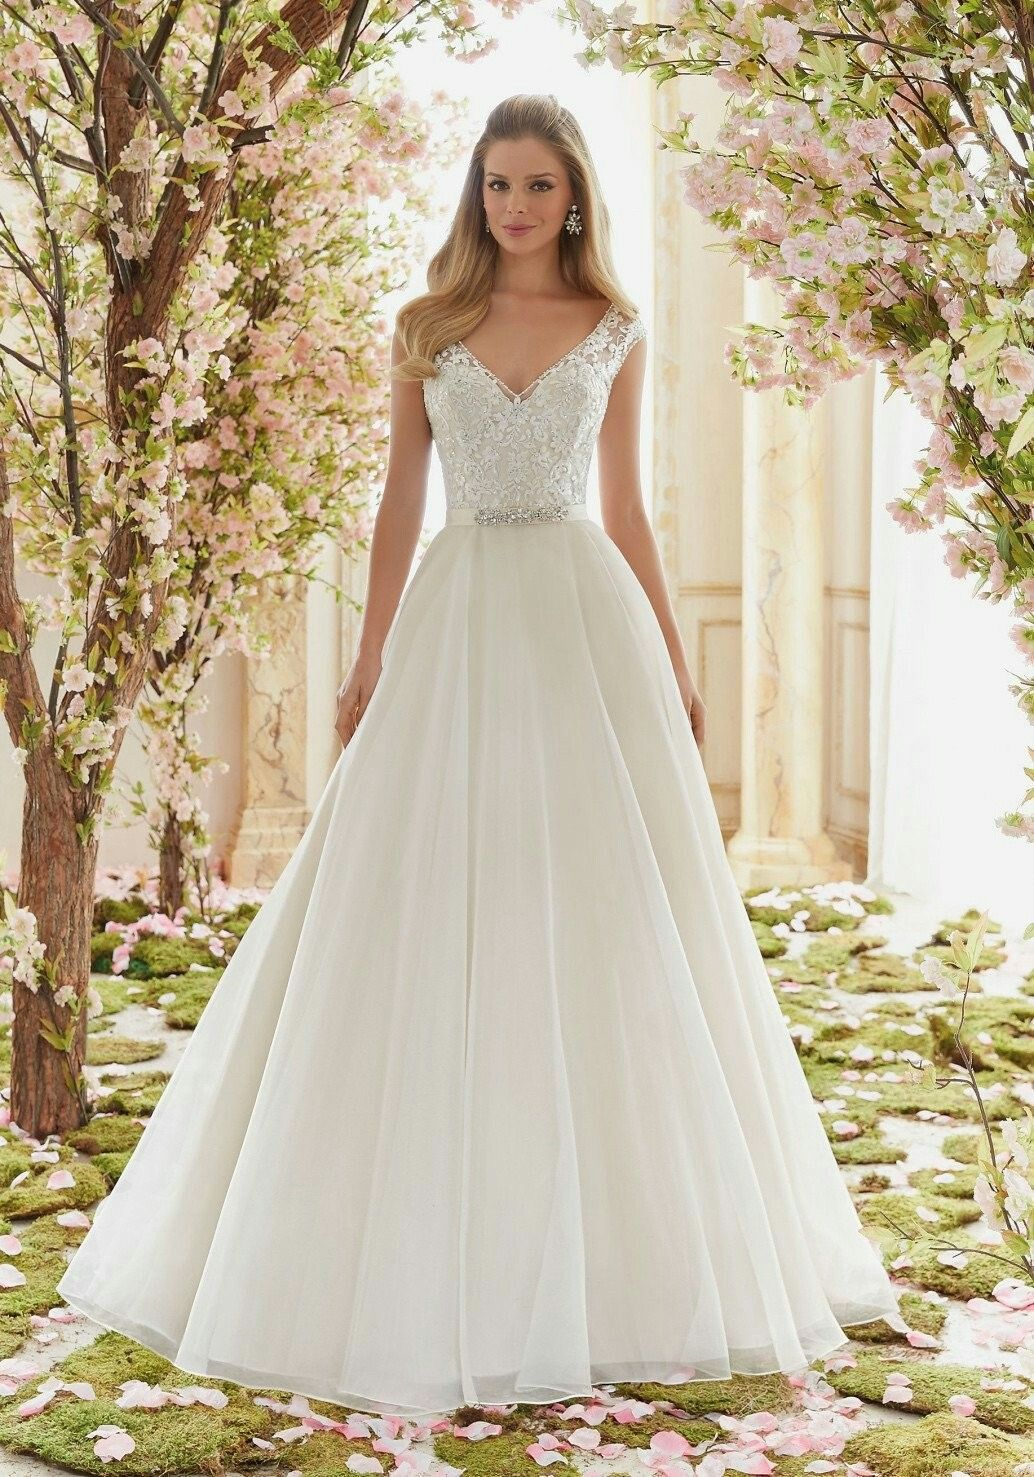 Alfred angelo dream maker wedding dress  Pin by Şeker Portakalı on Elbiseler  Pinterest  Wedding dress